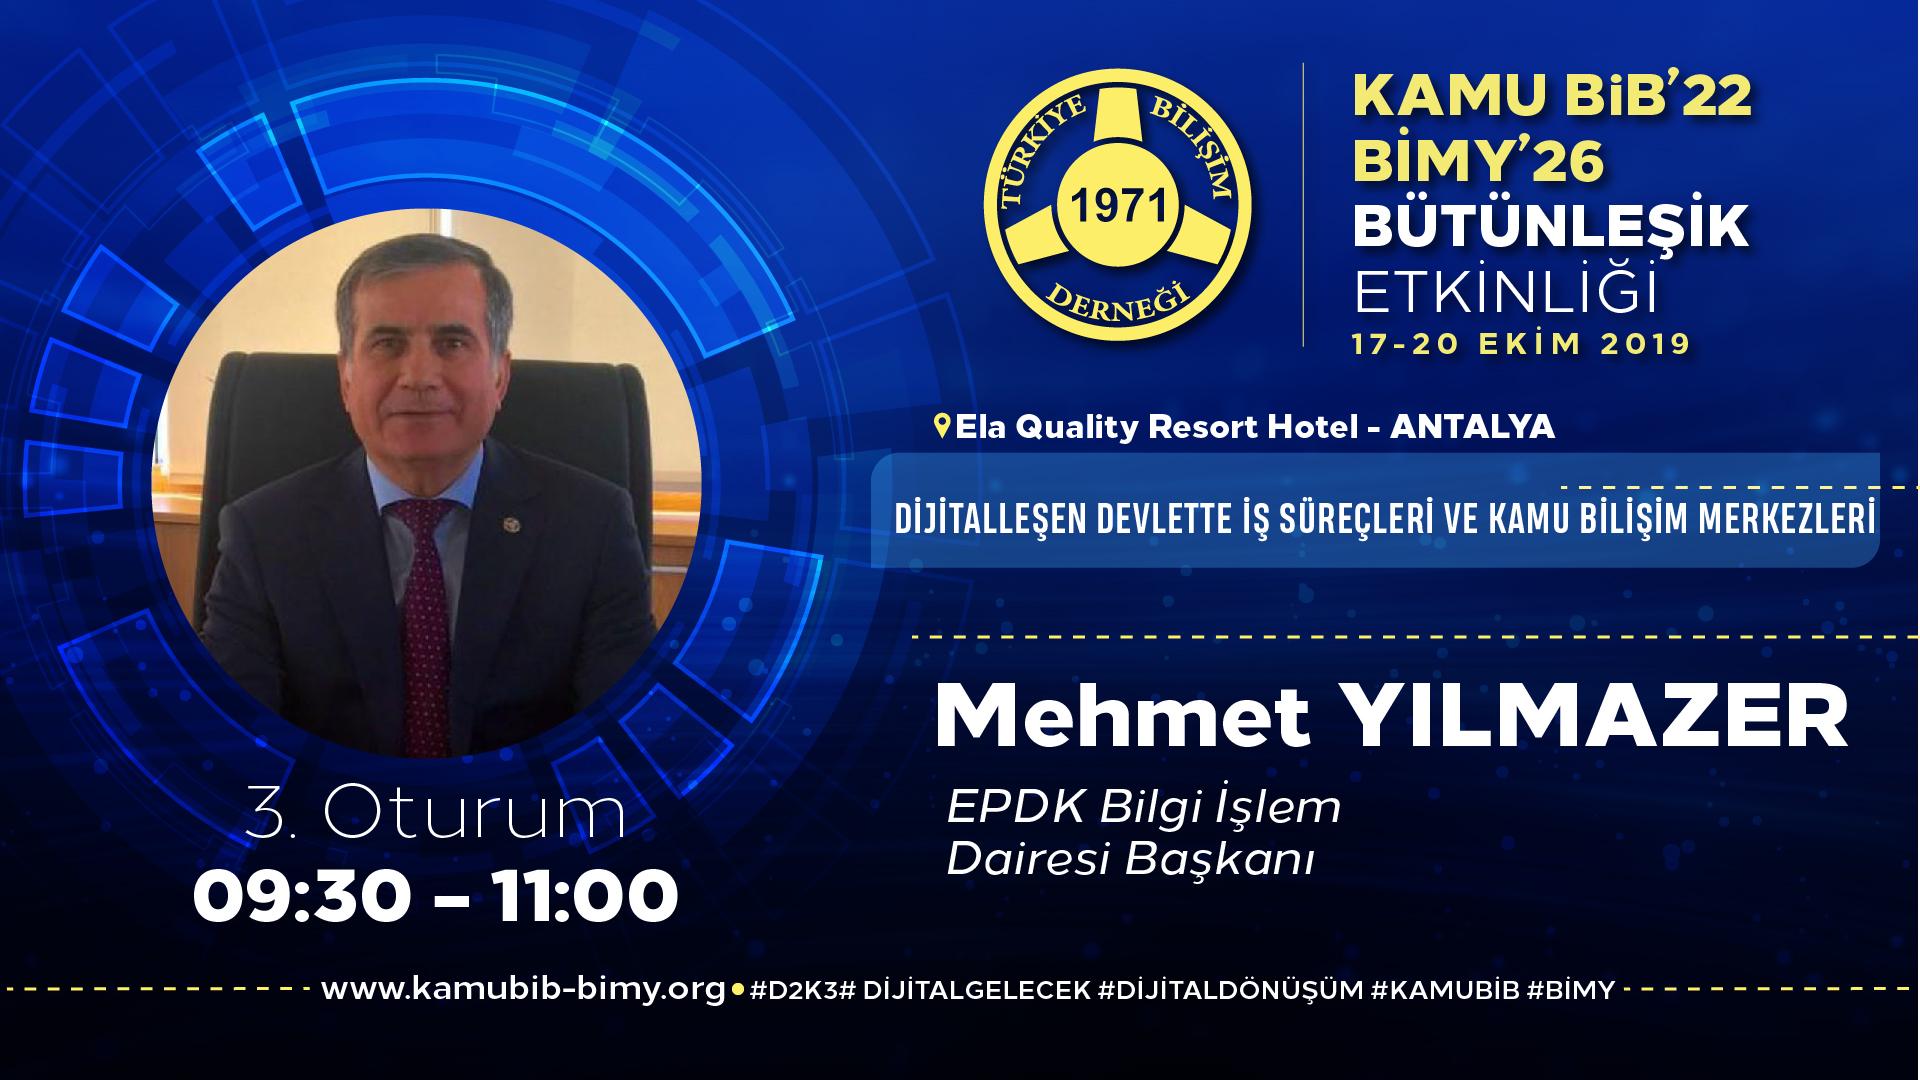 Mehmet YILMAZER - KamuBİB'22 BİMY'26